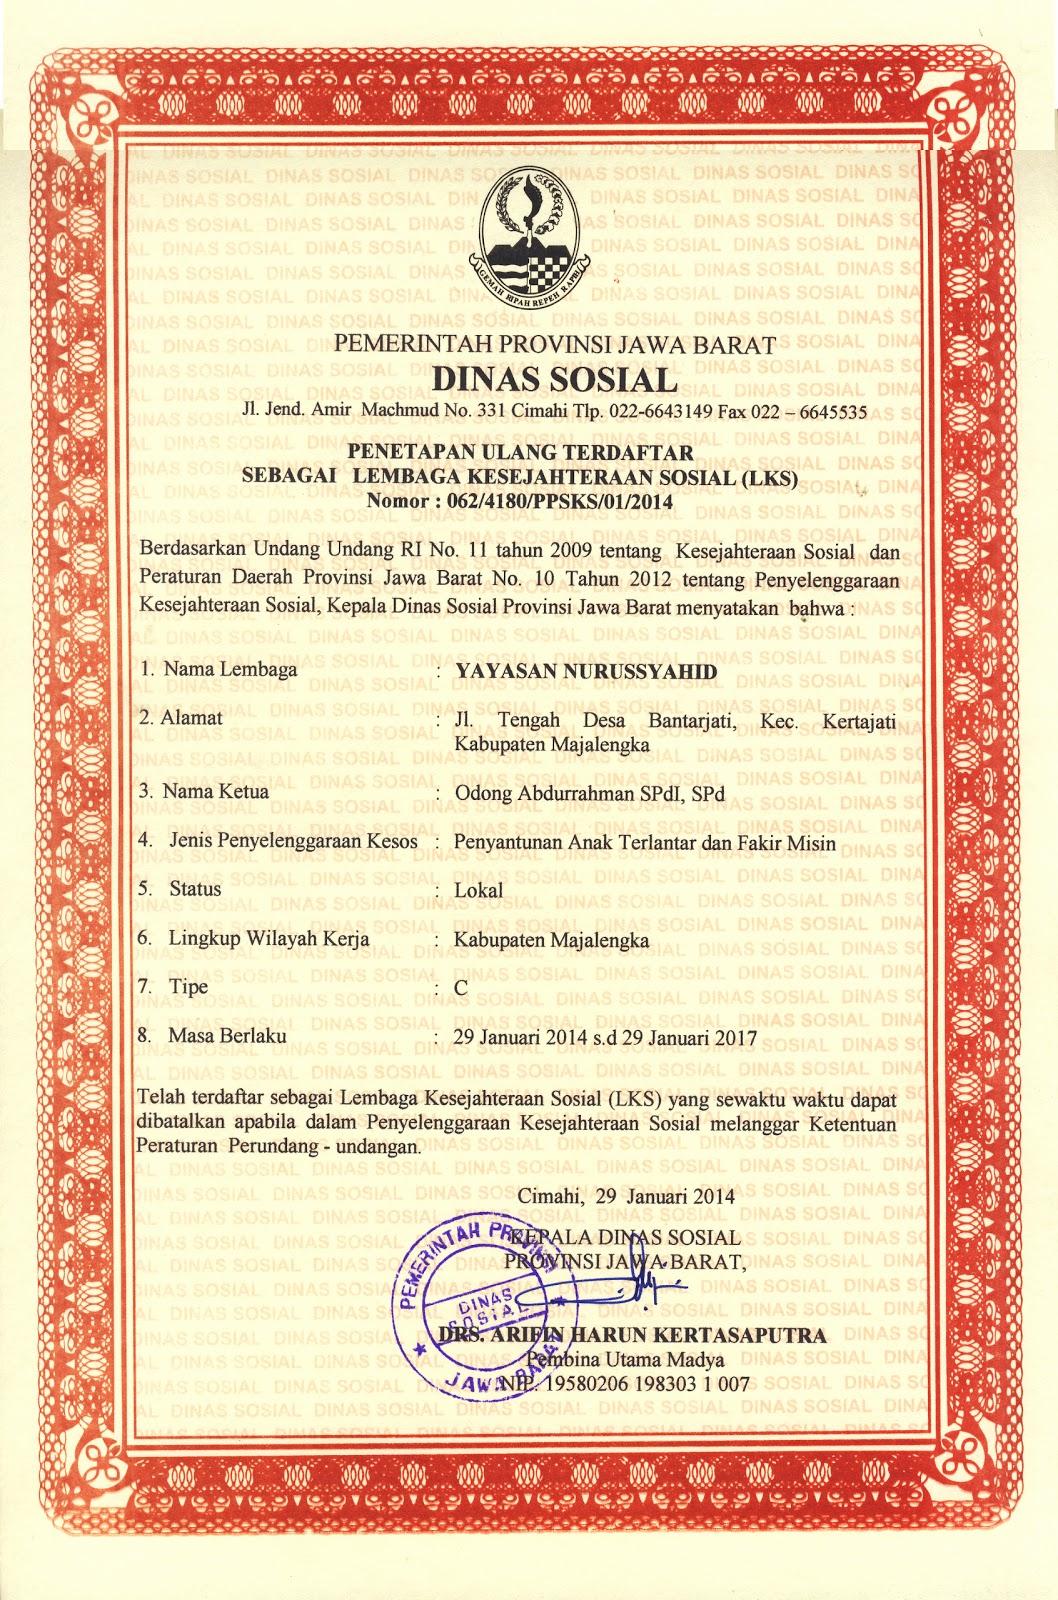 Surat Iizin Operasional Yayasan Nurussyahid Dari Dinas